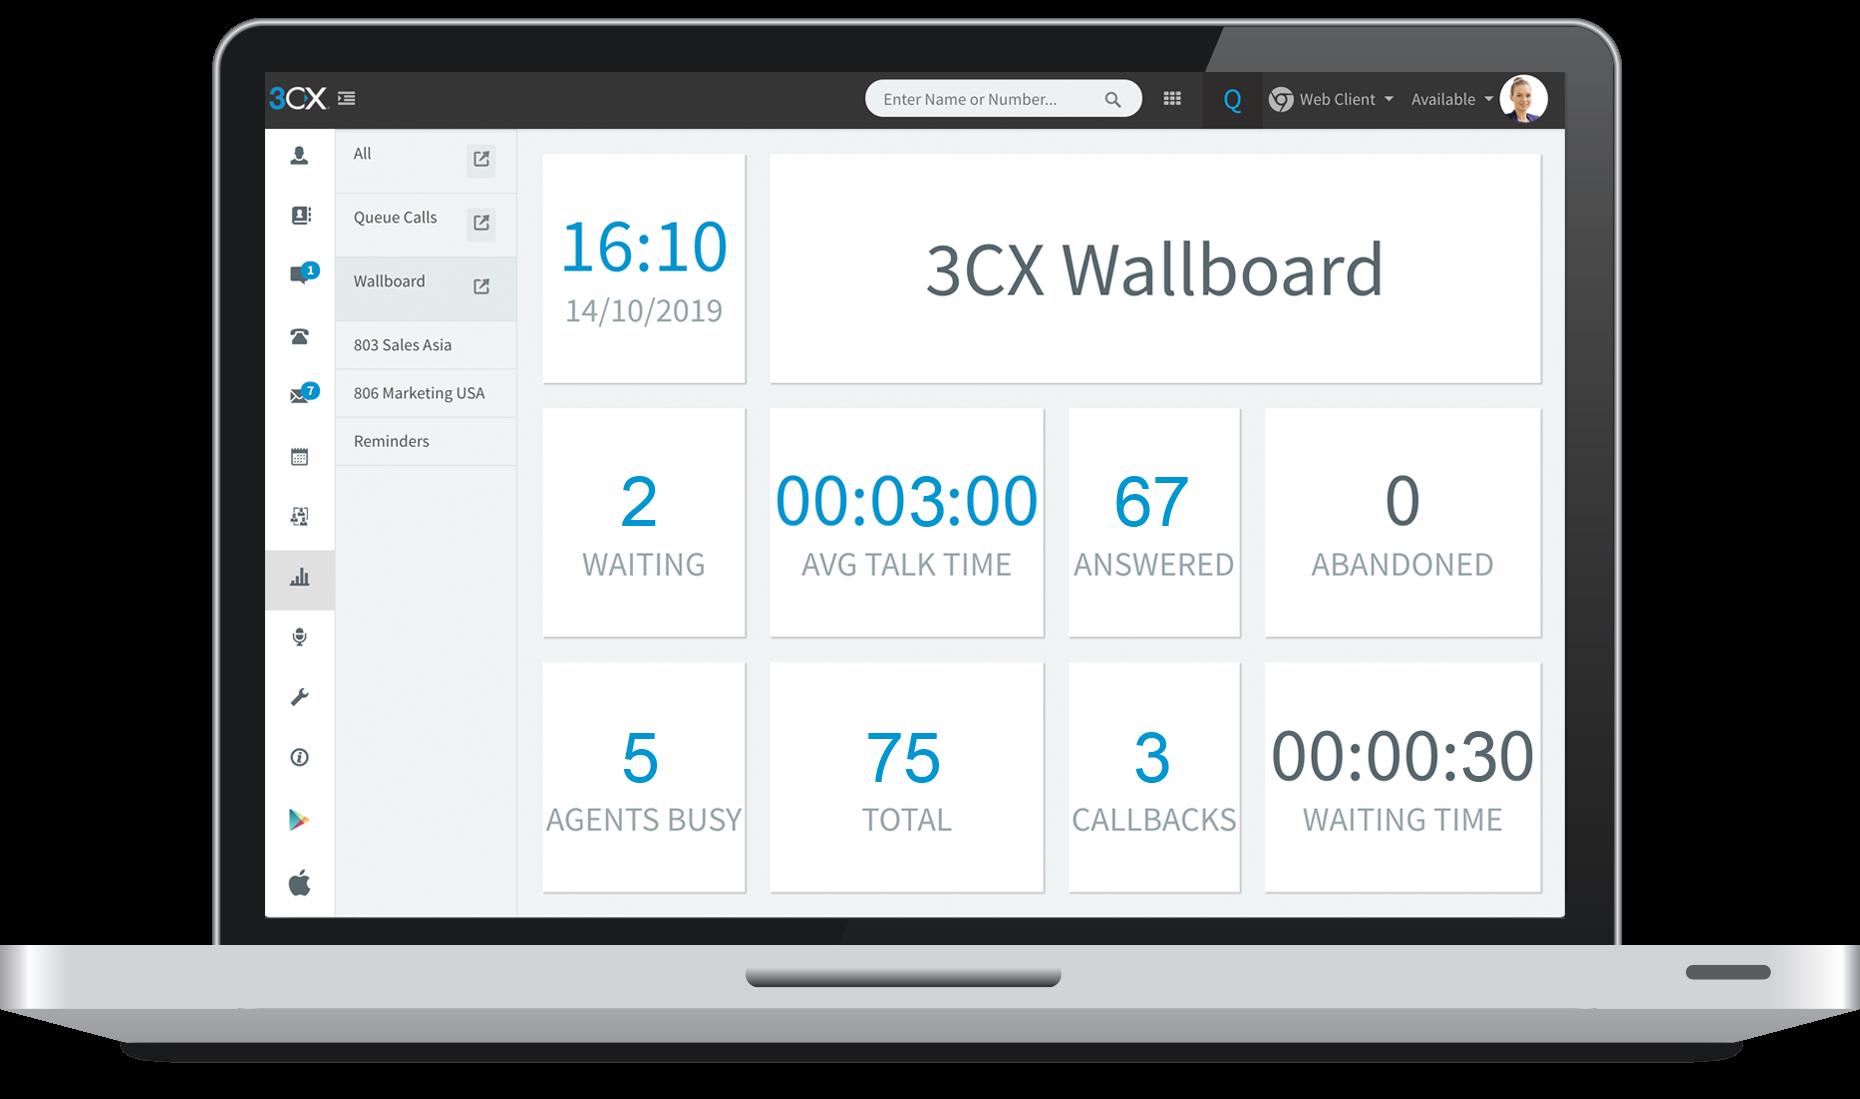 3CX Software - 3CX wallboard